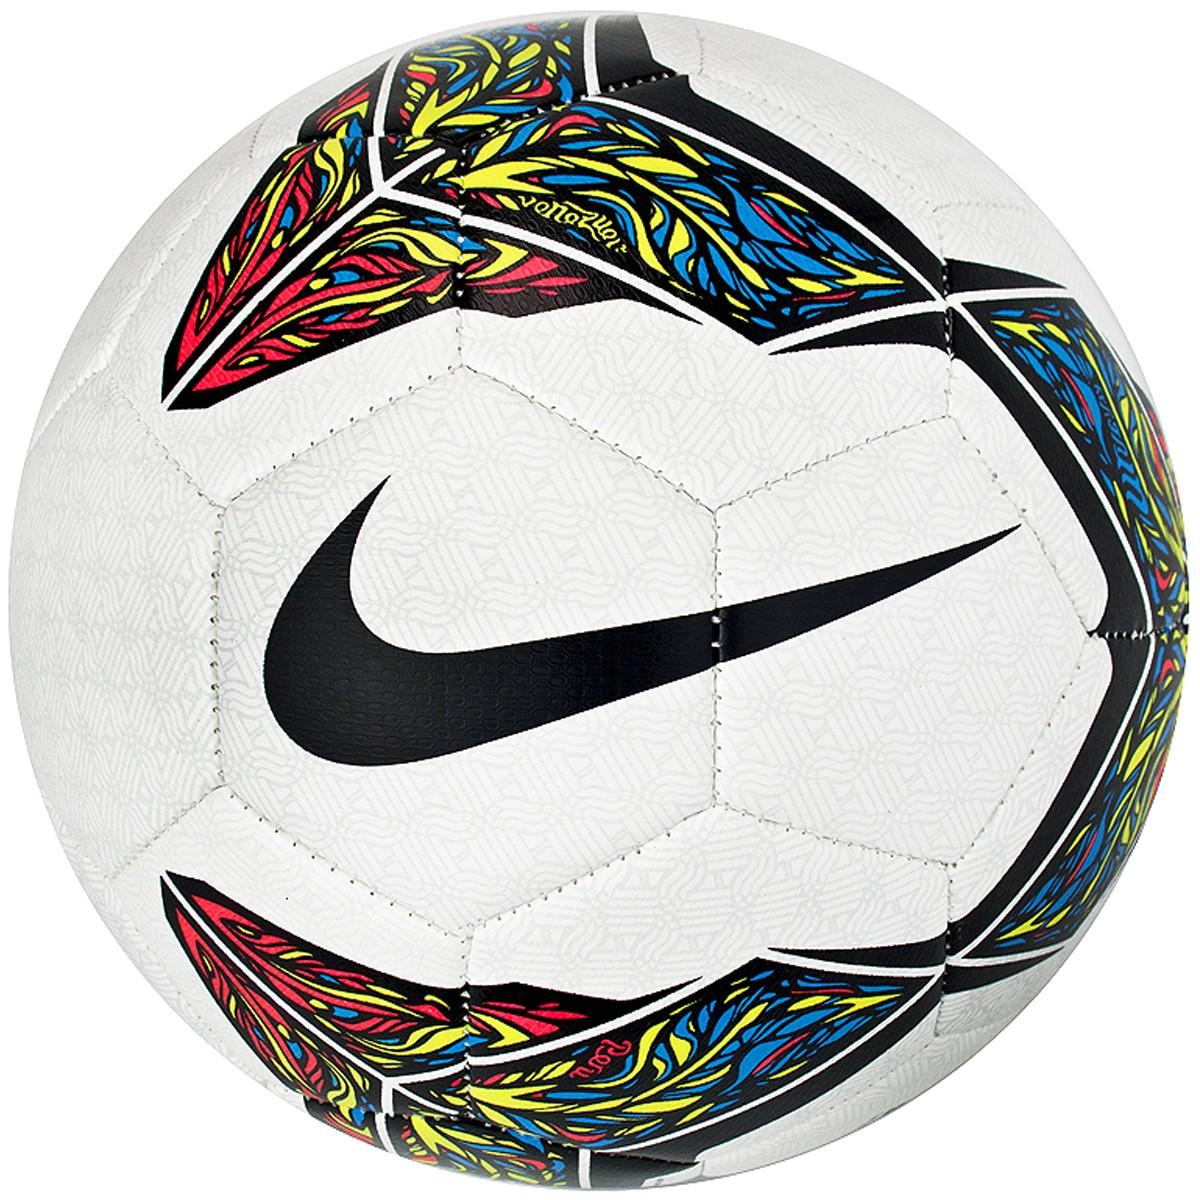 a716e4c38b Bola Nike Strike C.S.F. SC2416